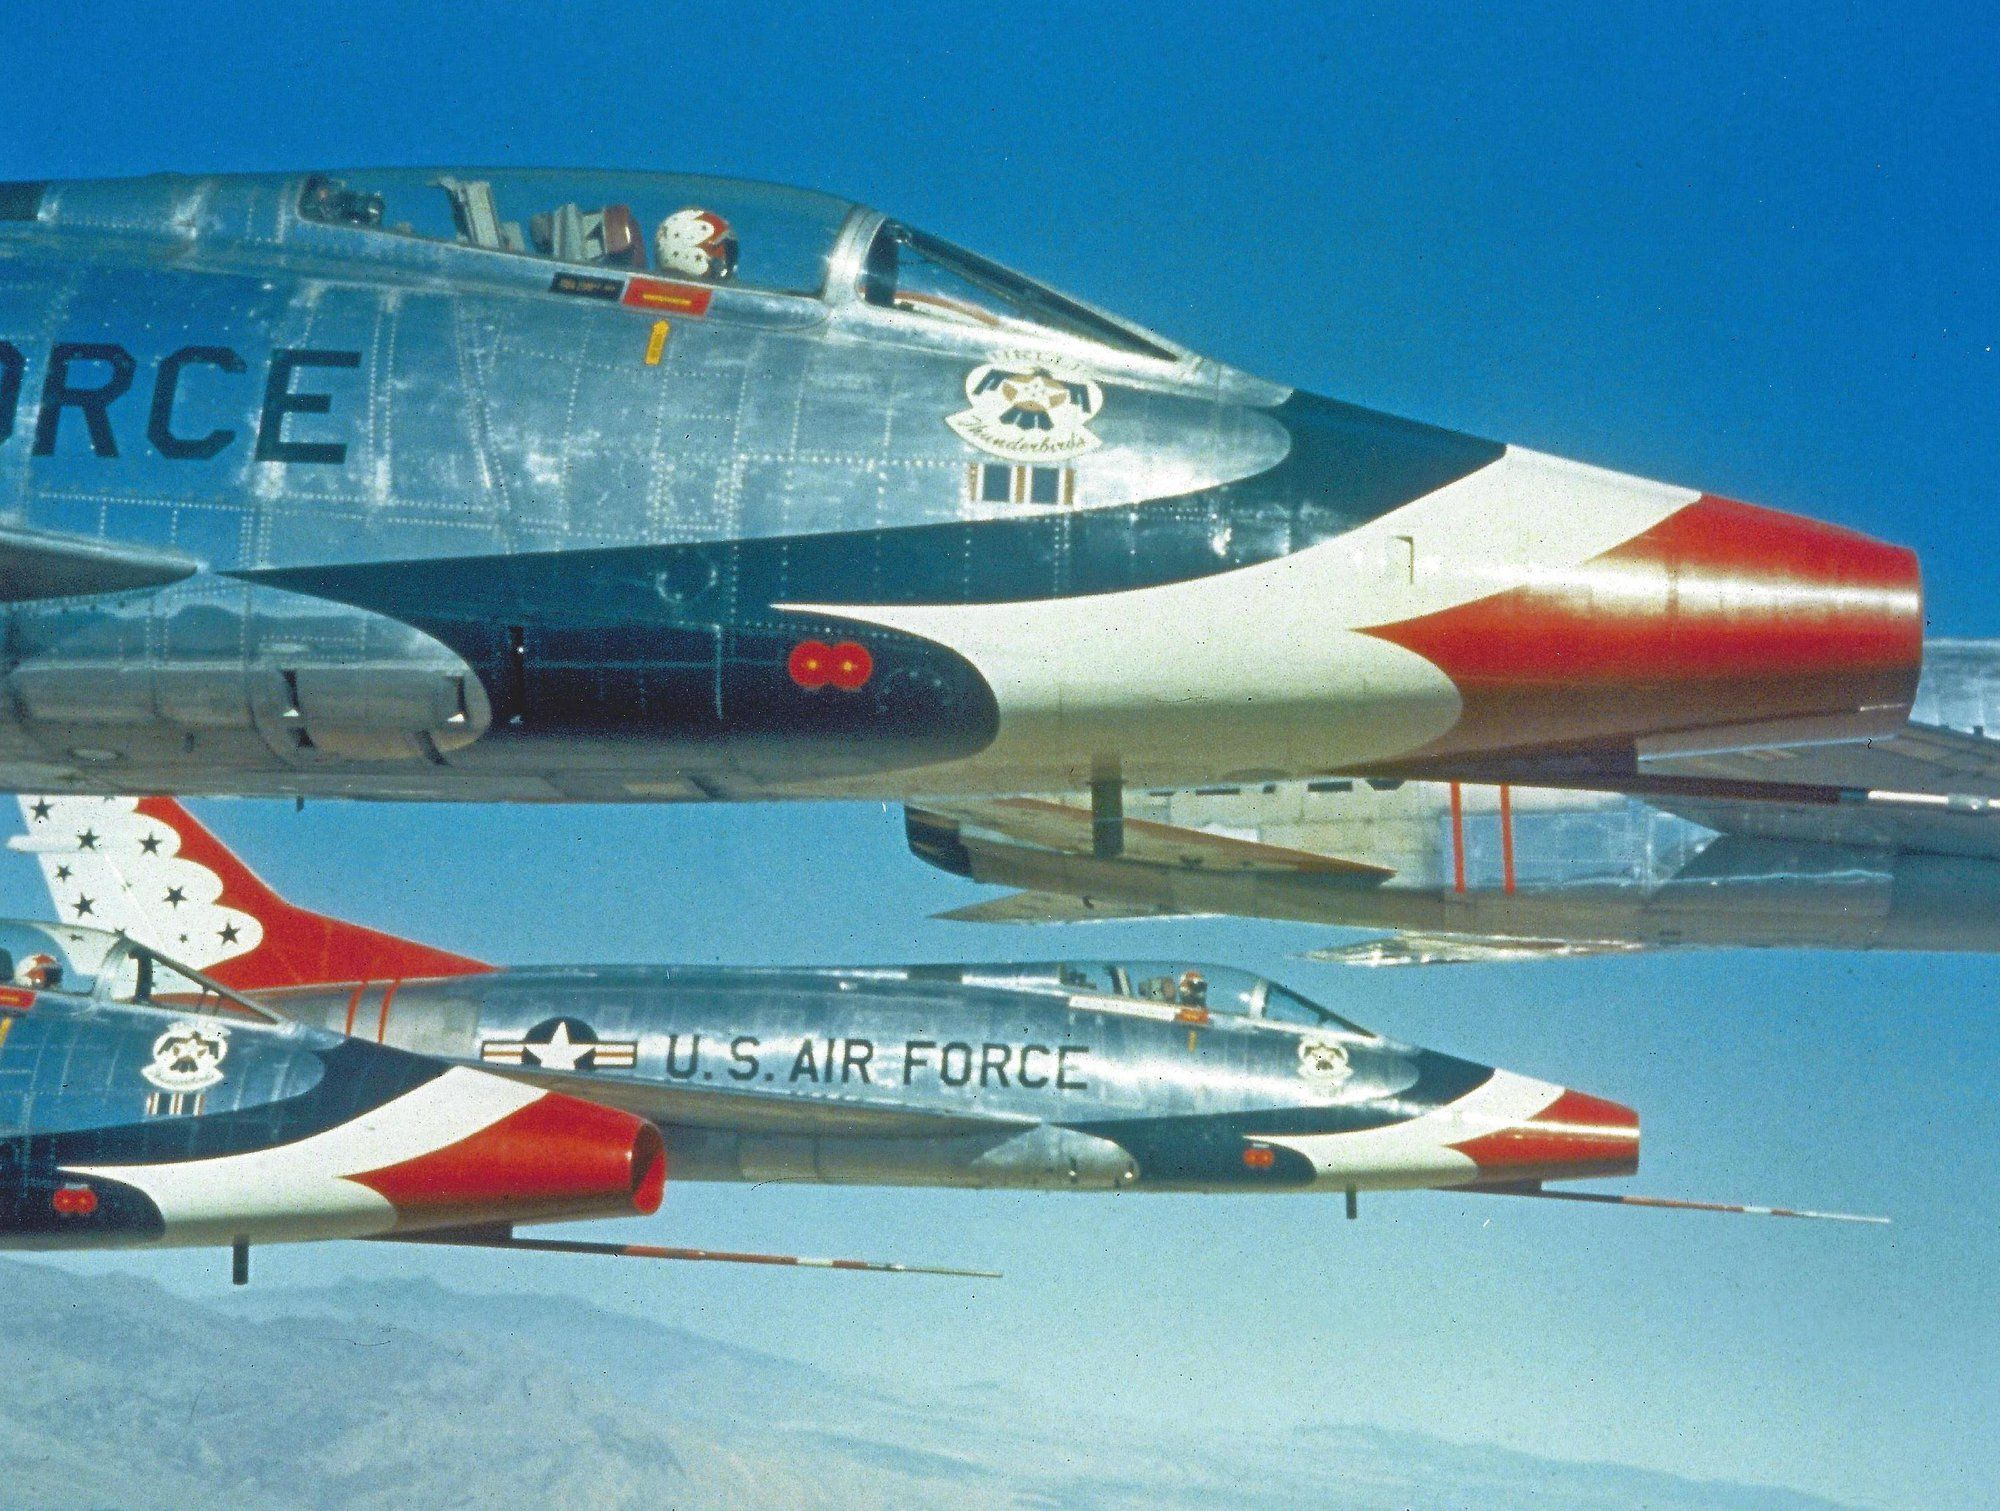 USAF F100 Thunderbirds (With images) Usaf thunderbirds